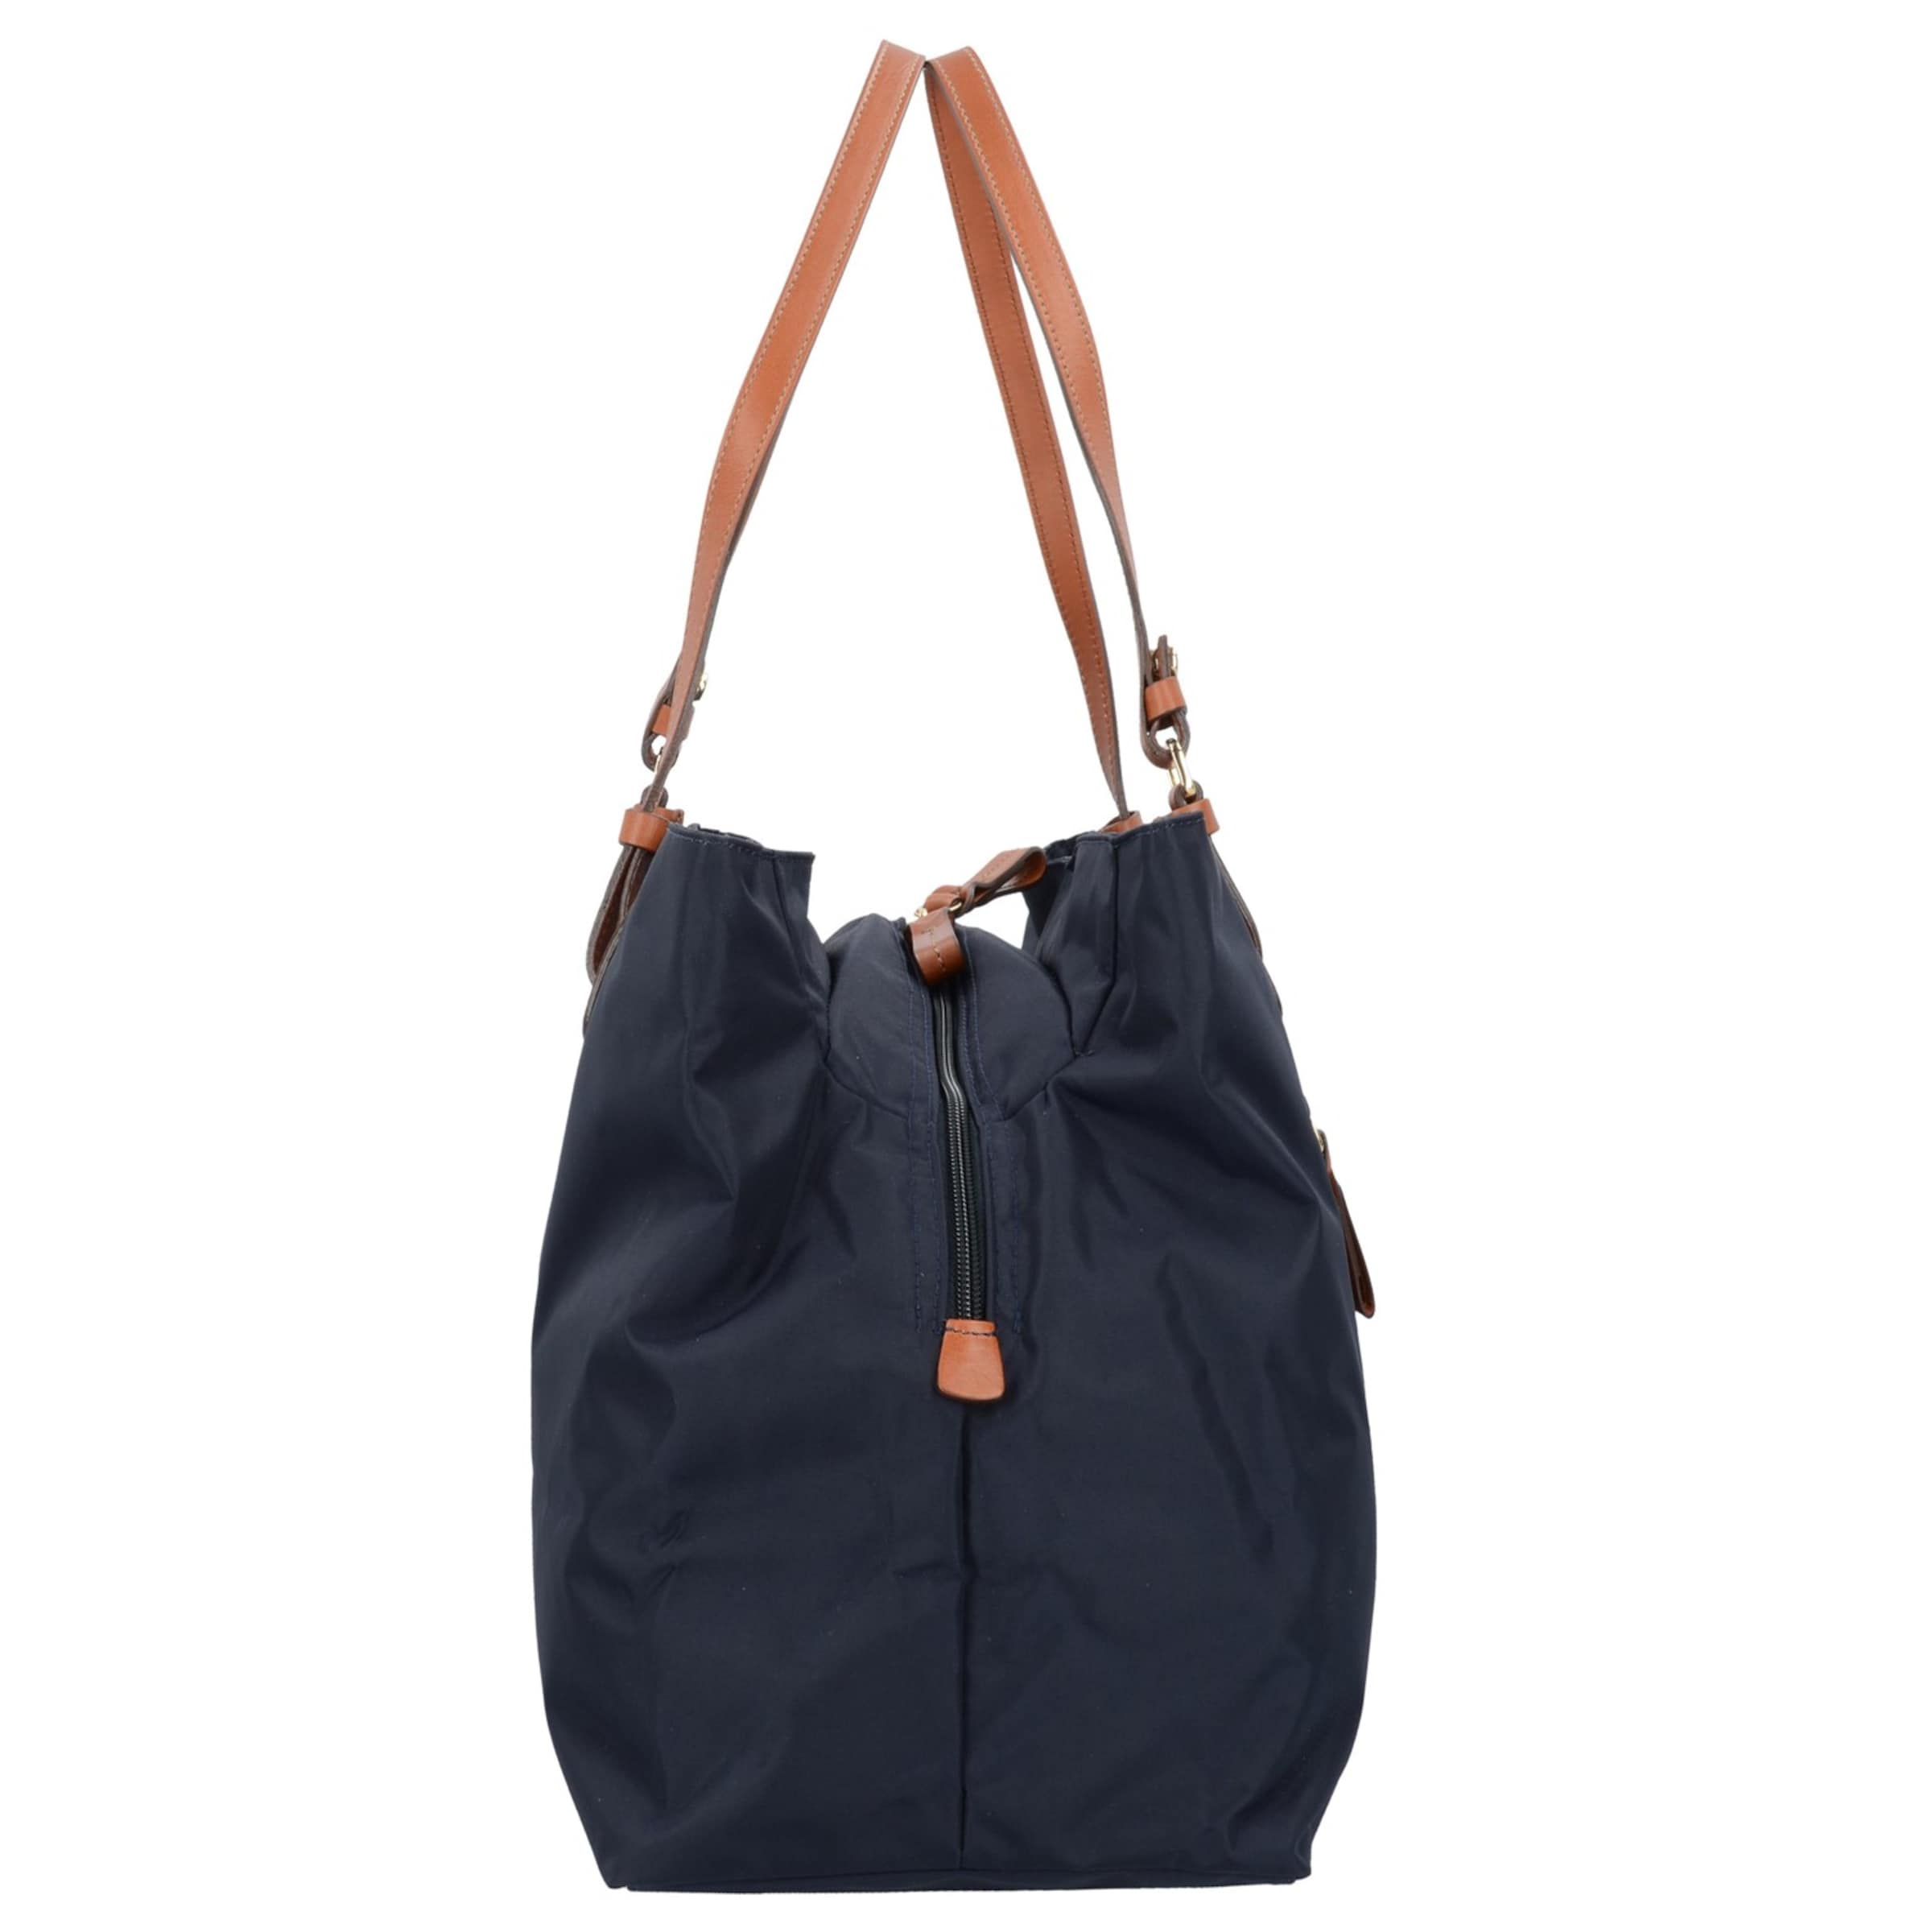 Bric's X-Bag Schultertasche 40 cm Rabatt Großer Verkauf Billig Offiziellen Günstig Kaufen Billig 2d6kH9rDxT